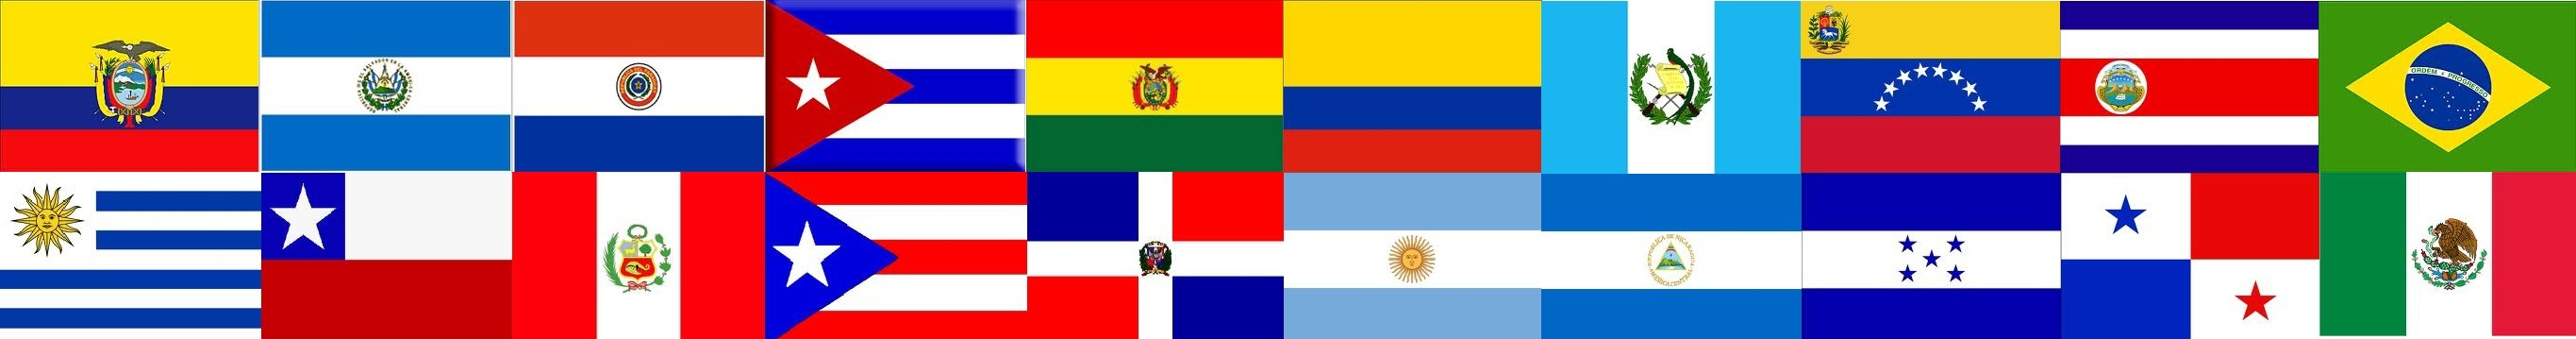 Image result for latin american flag banner